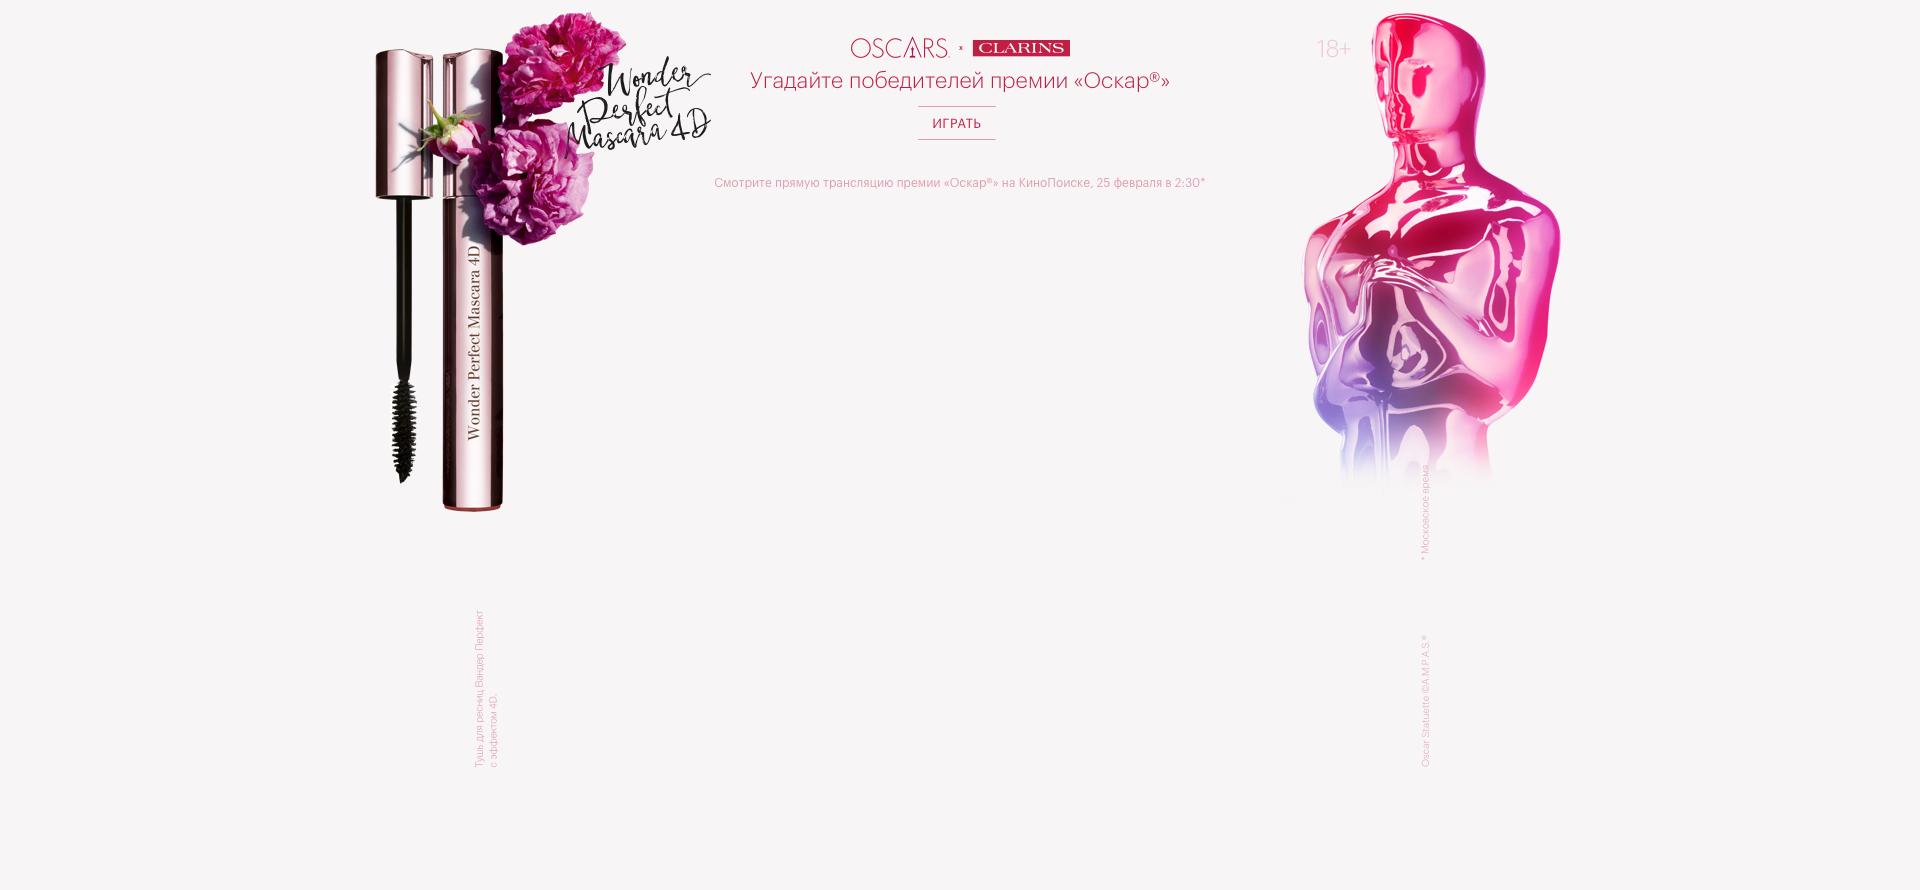 Картинки оргии бисексуалов видео онлайн девок старые мужики